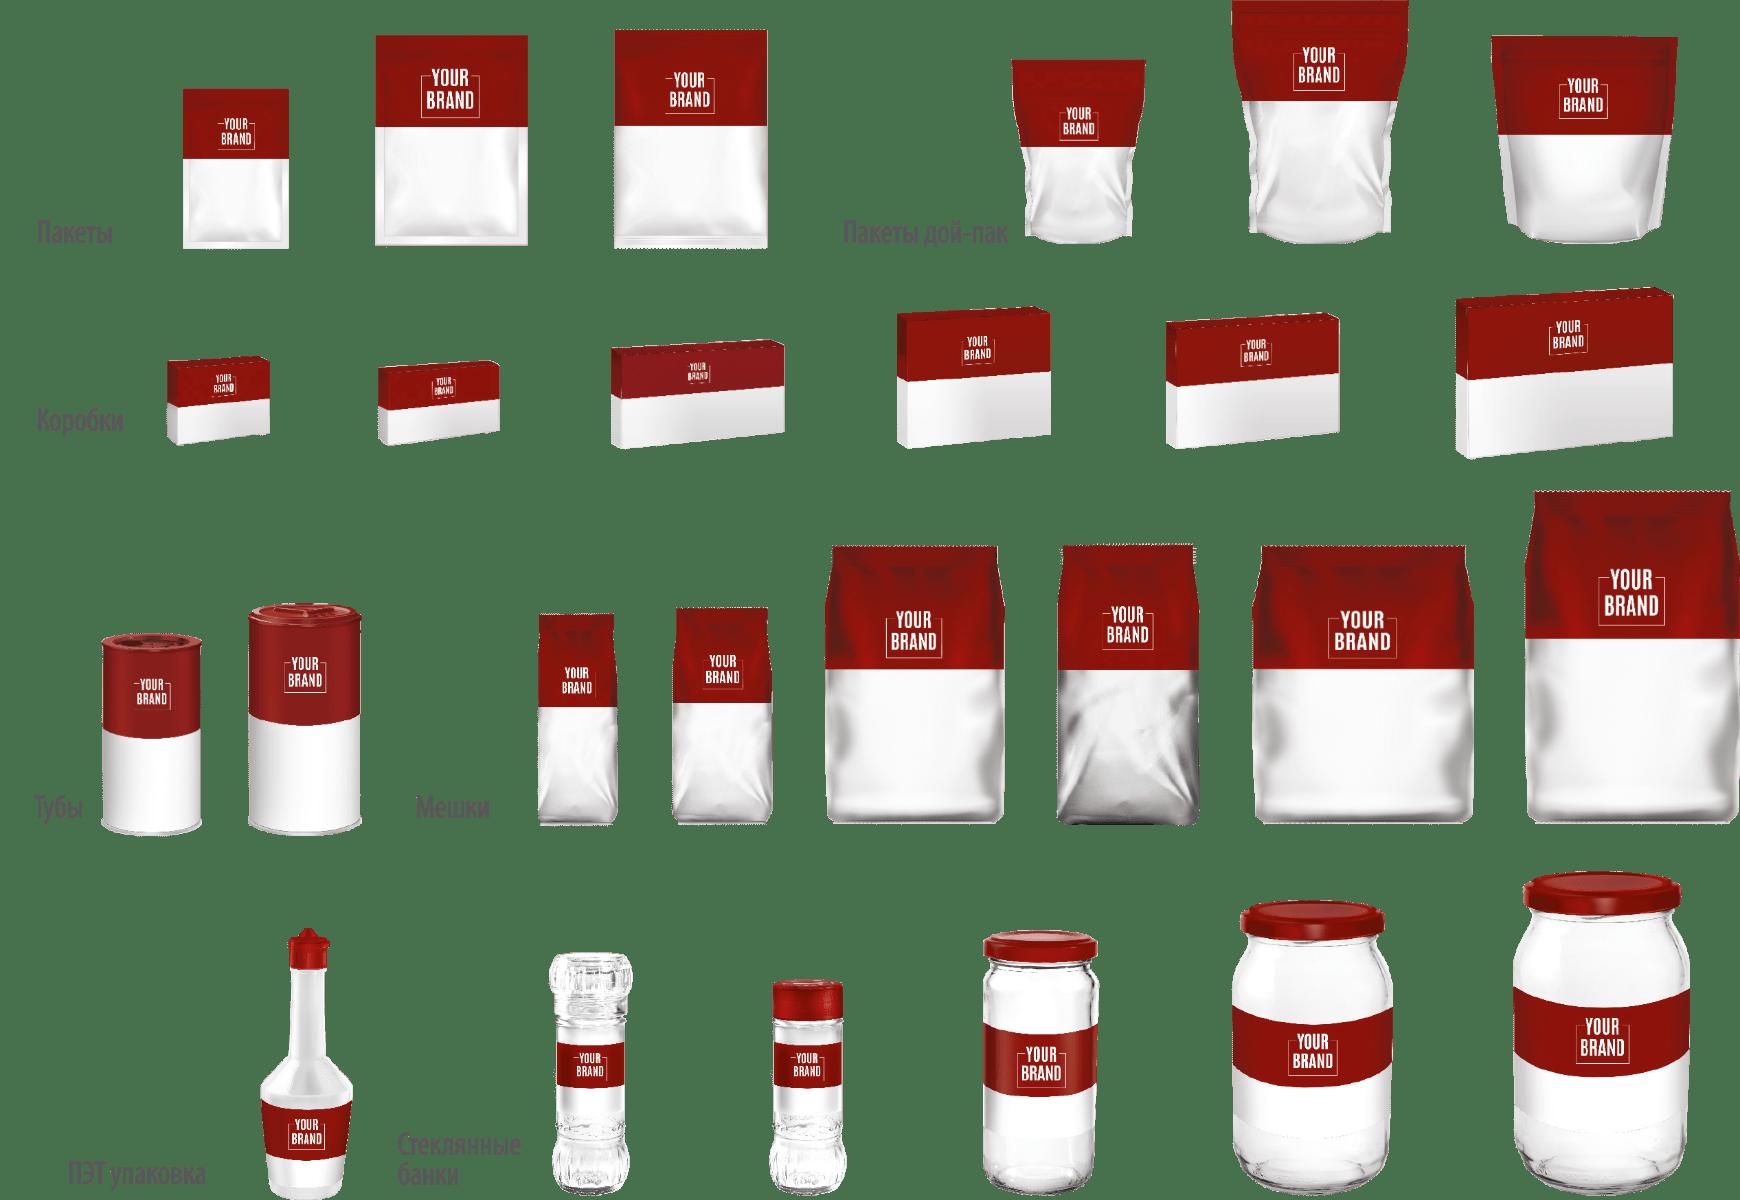 Pekny-Unimex-Prumysl-Упаковка-png